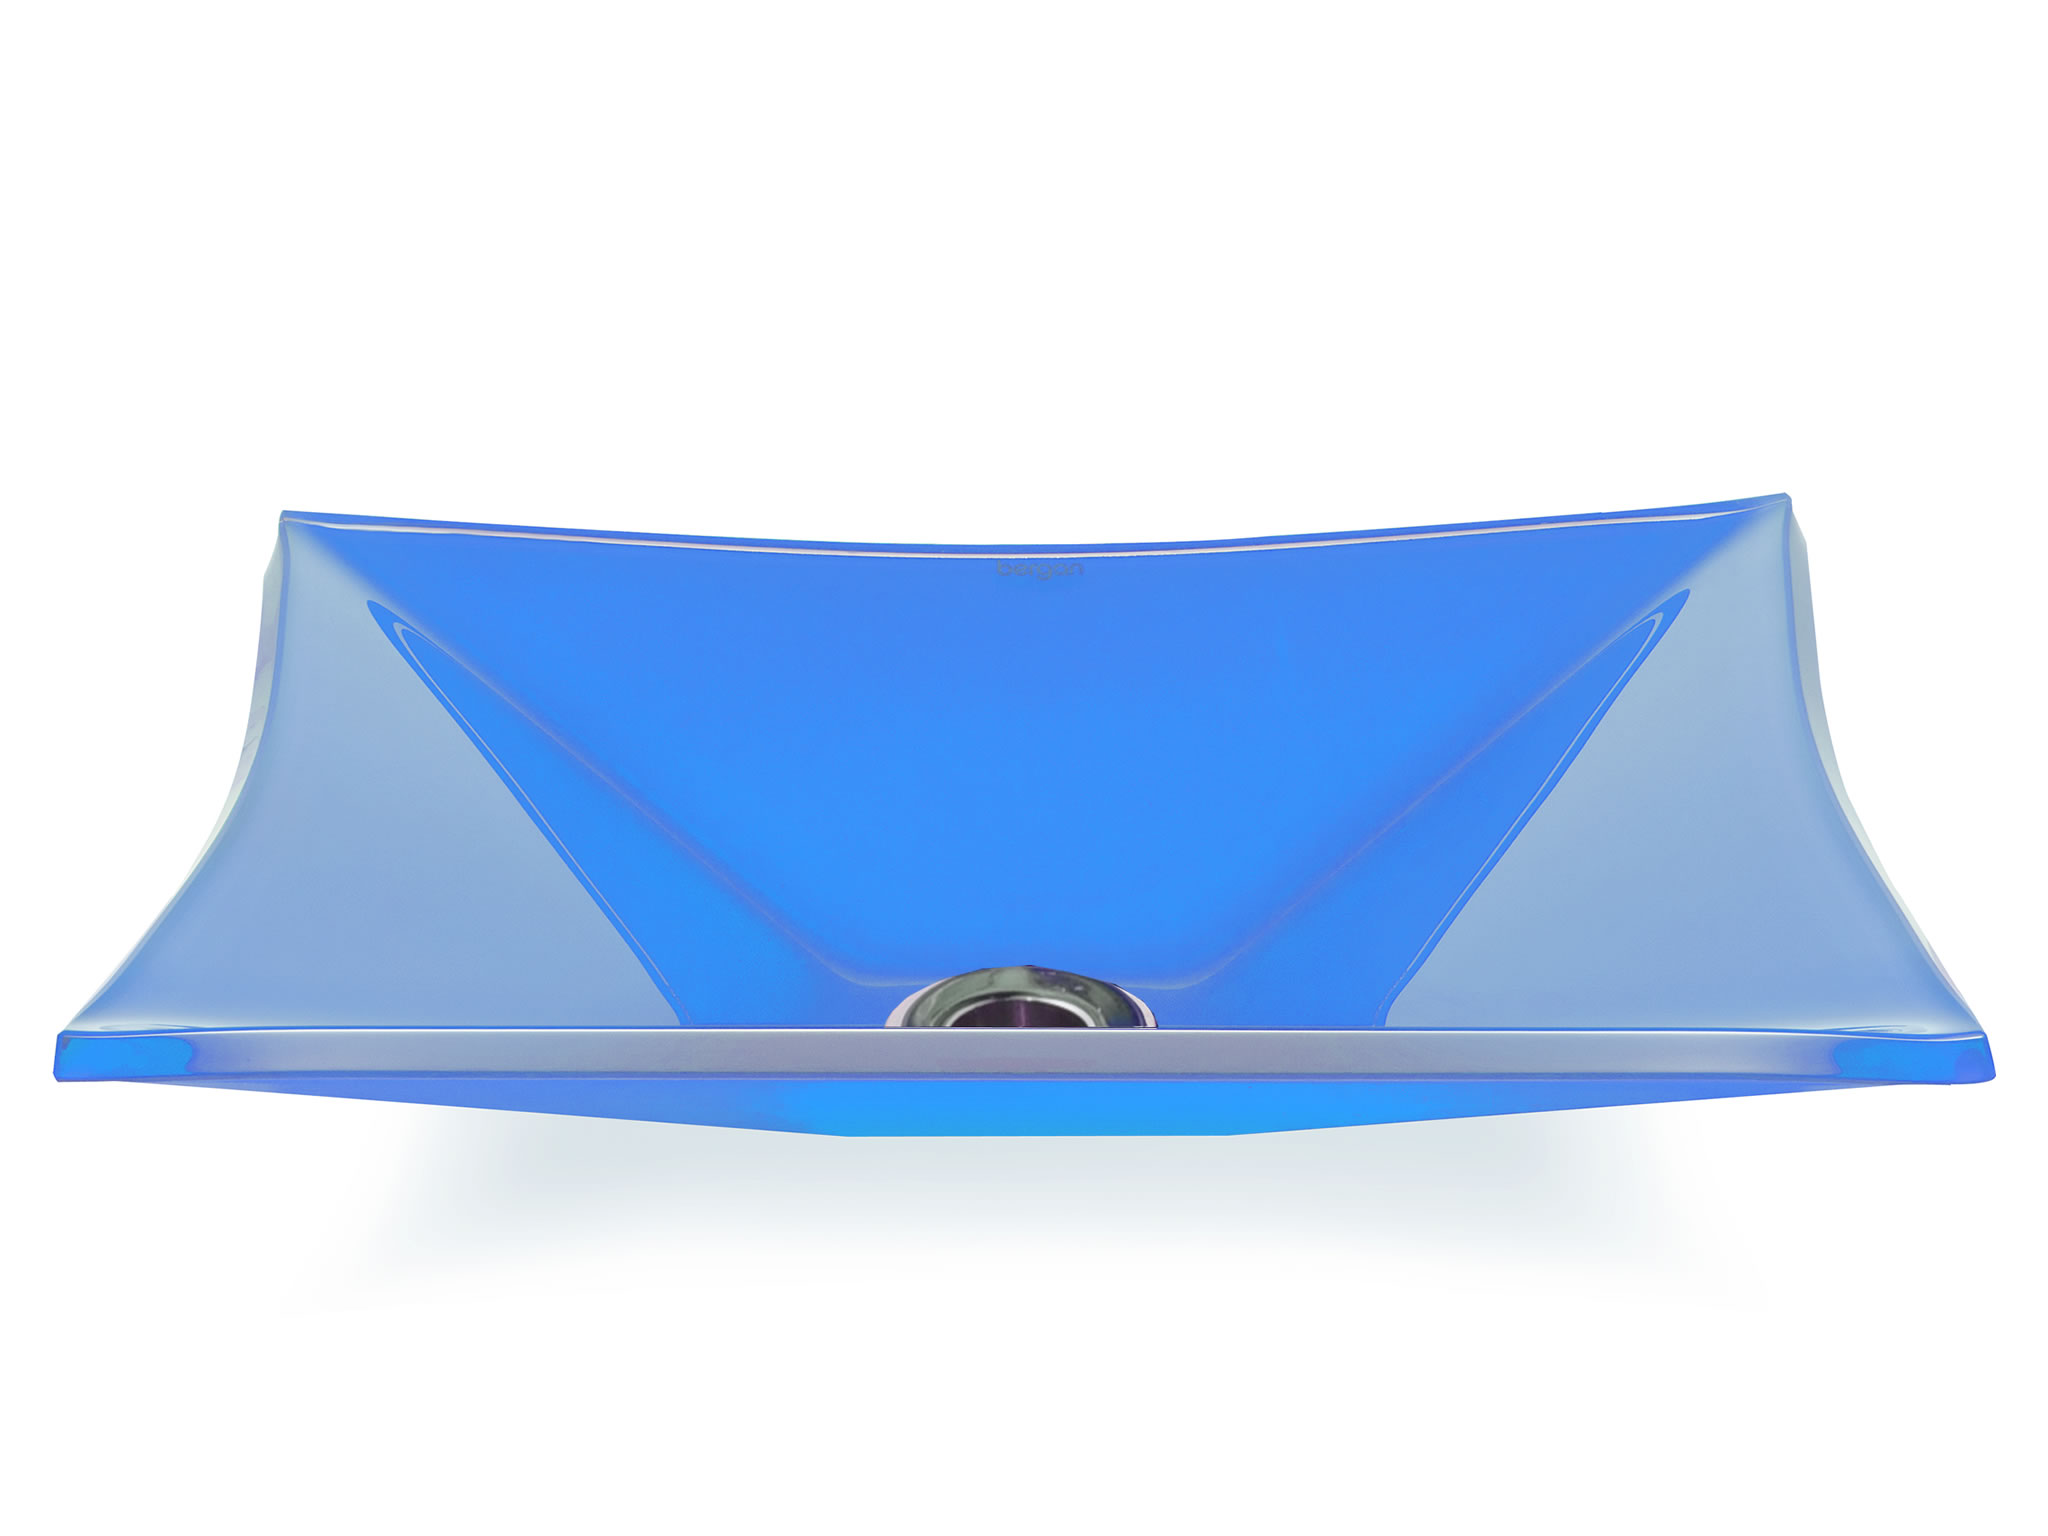 Cuba de vidro Grand Sulle 40x40 Cm Vidro azul claro Bergan